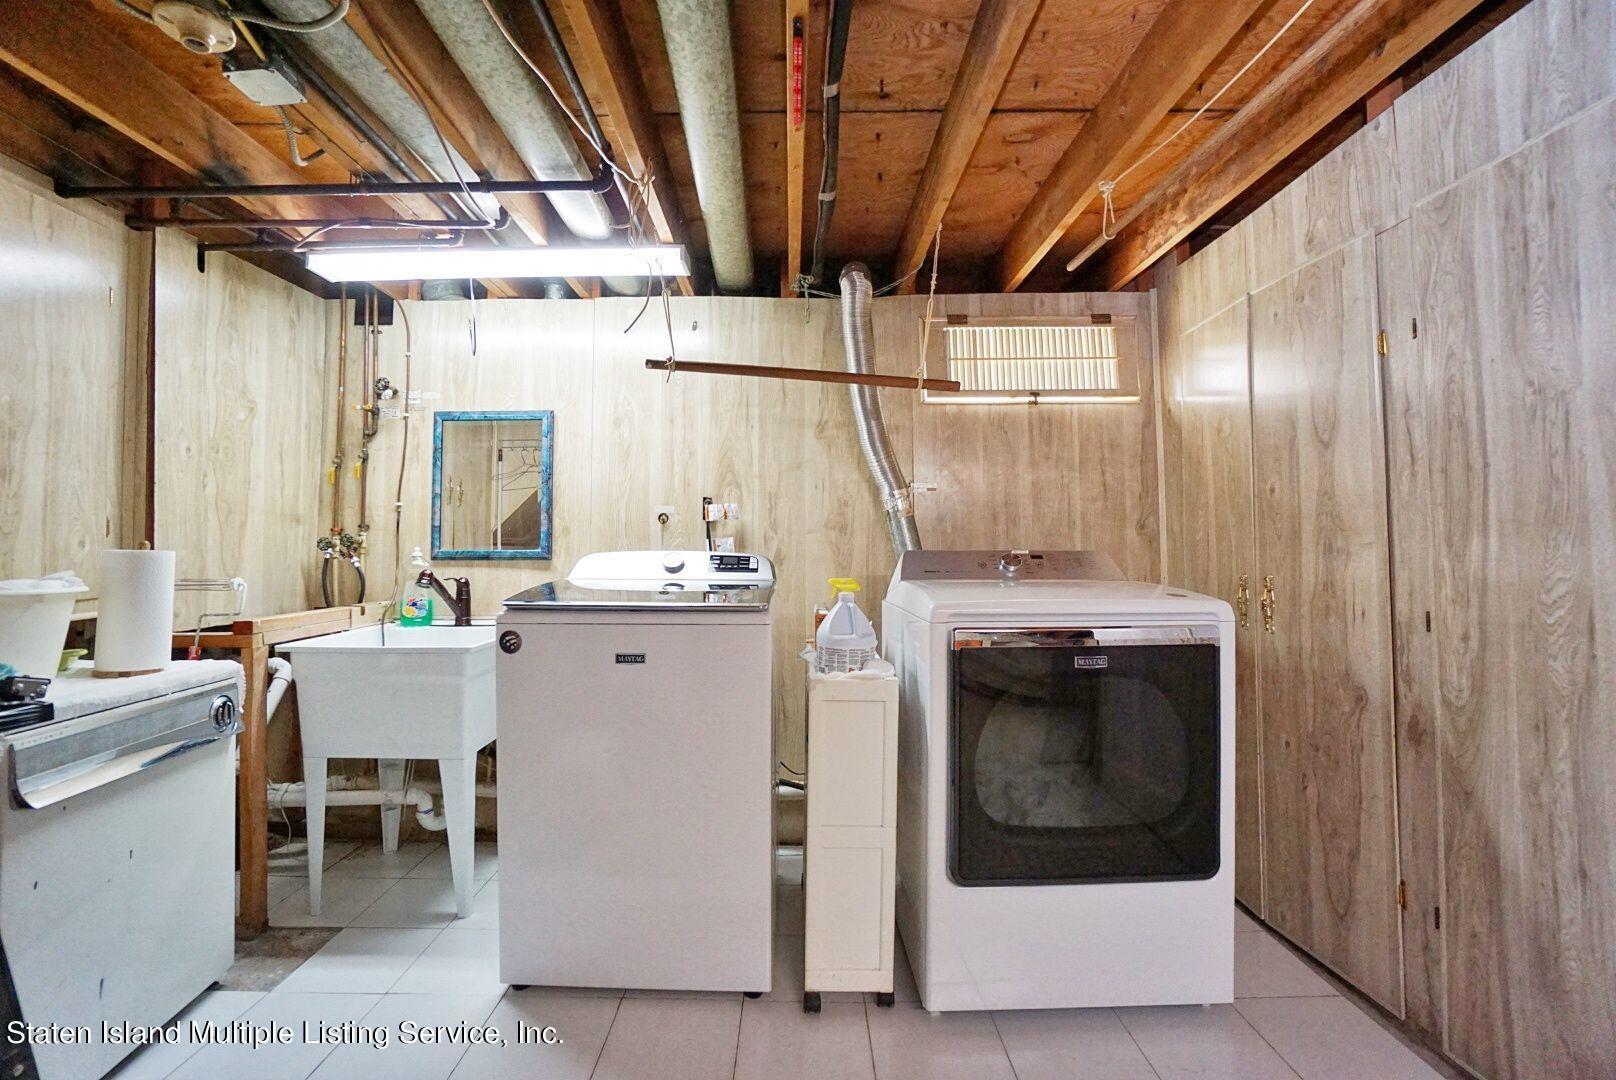 Single Family - Detached 94 Cranford Avenue  Staten Island, NY 10306, MLS-1146620-40